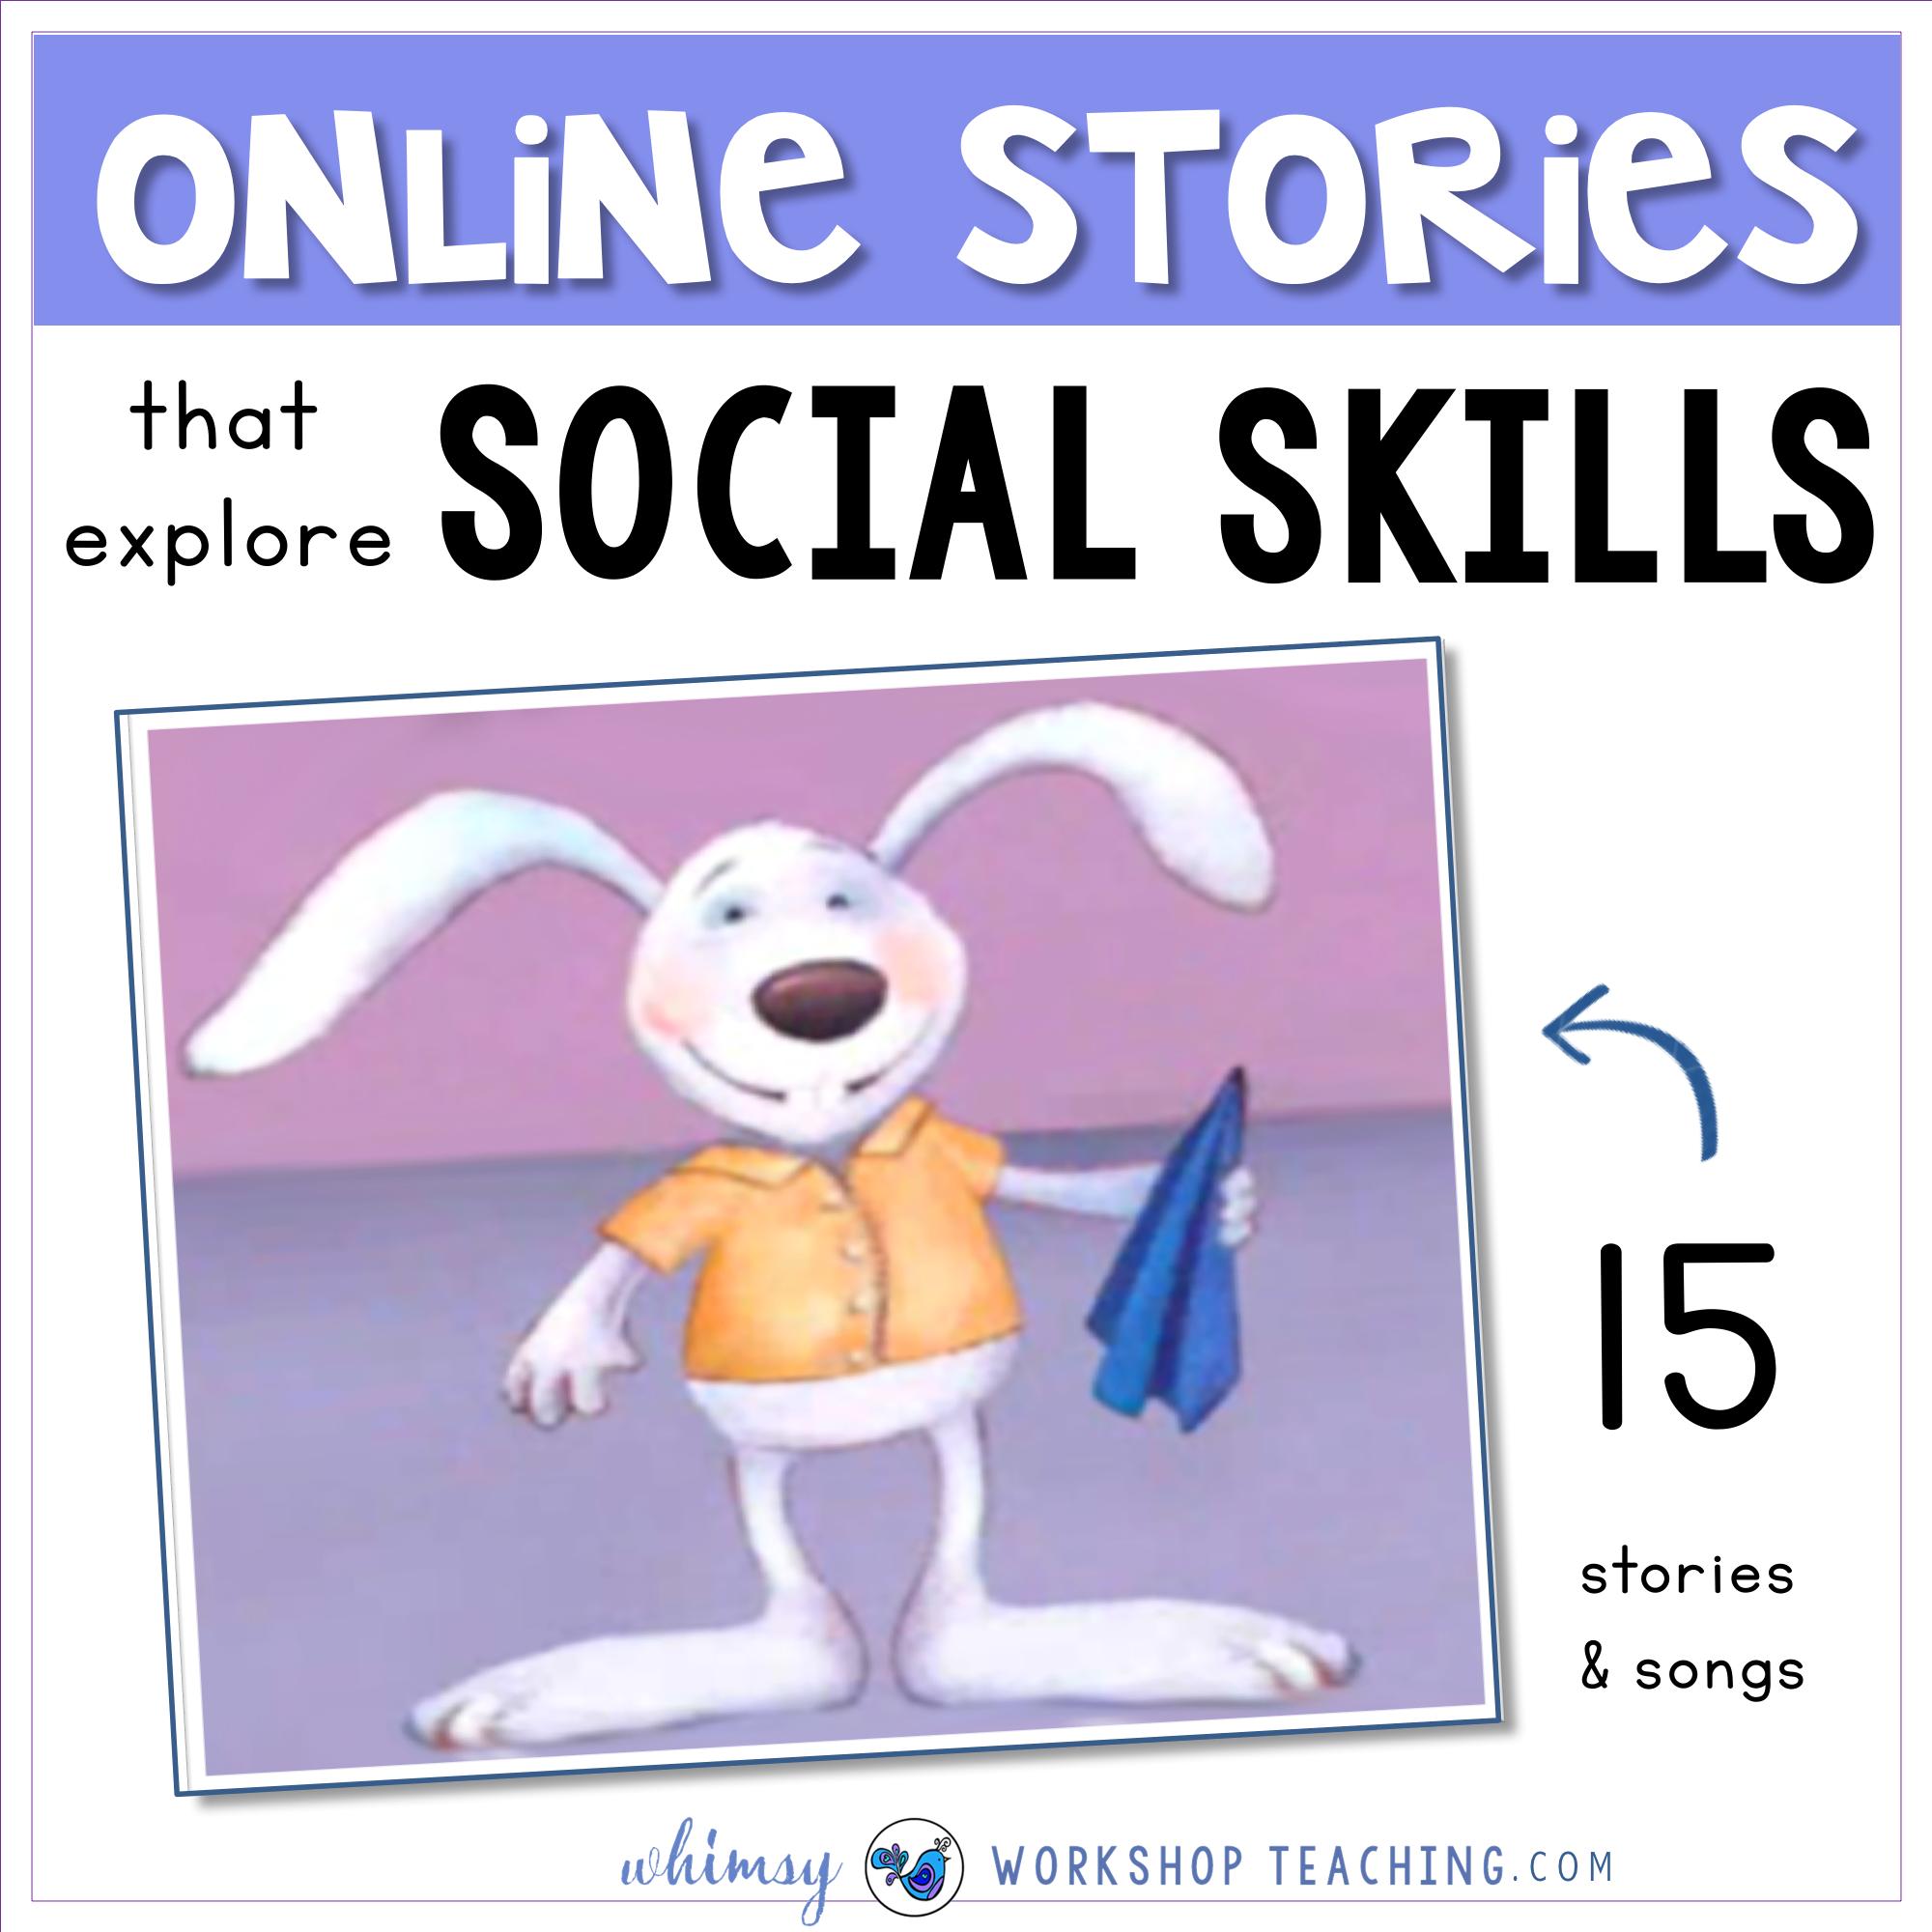 online stories that explore social skills